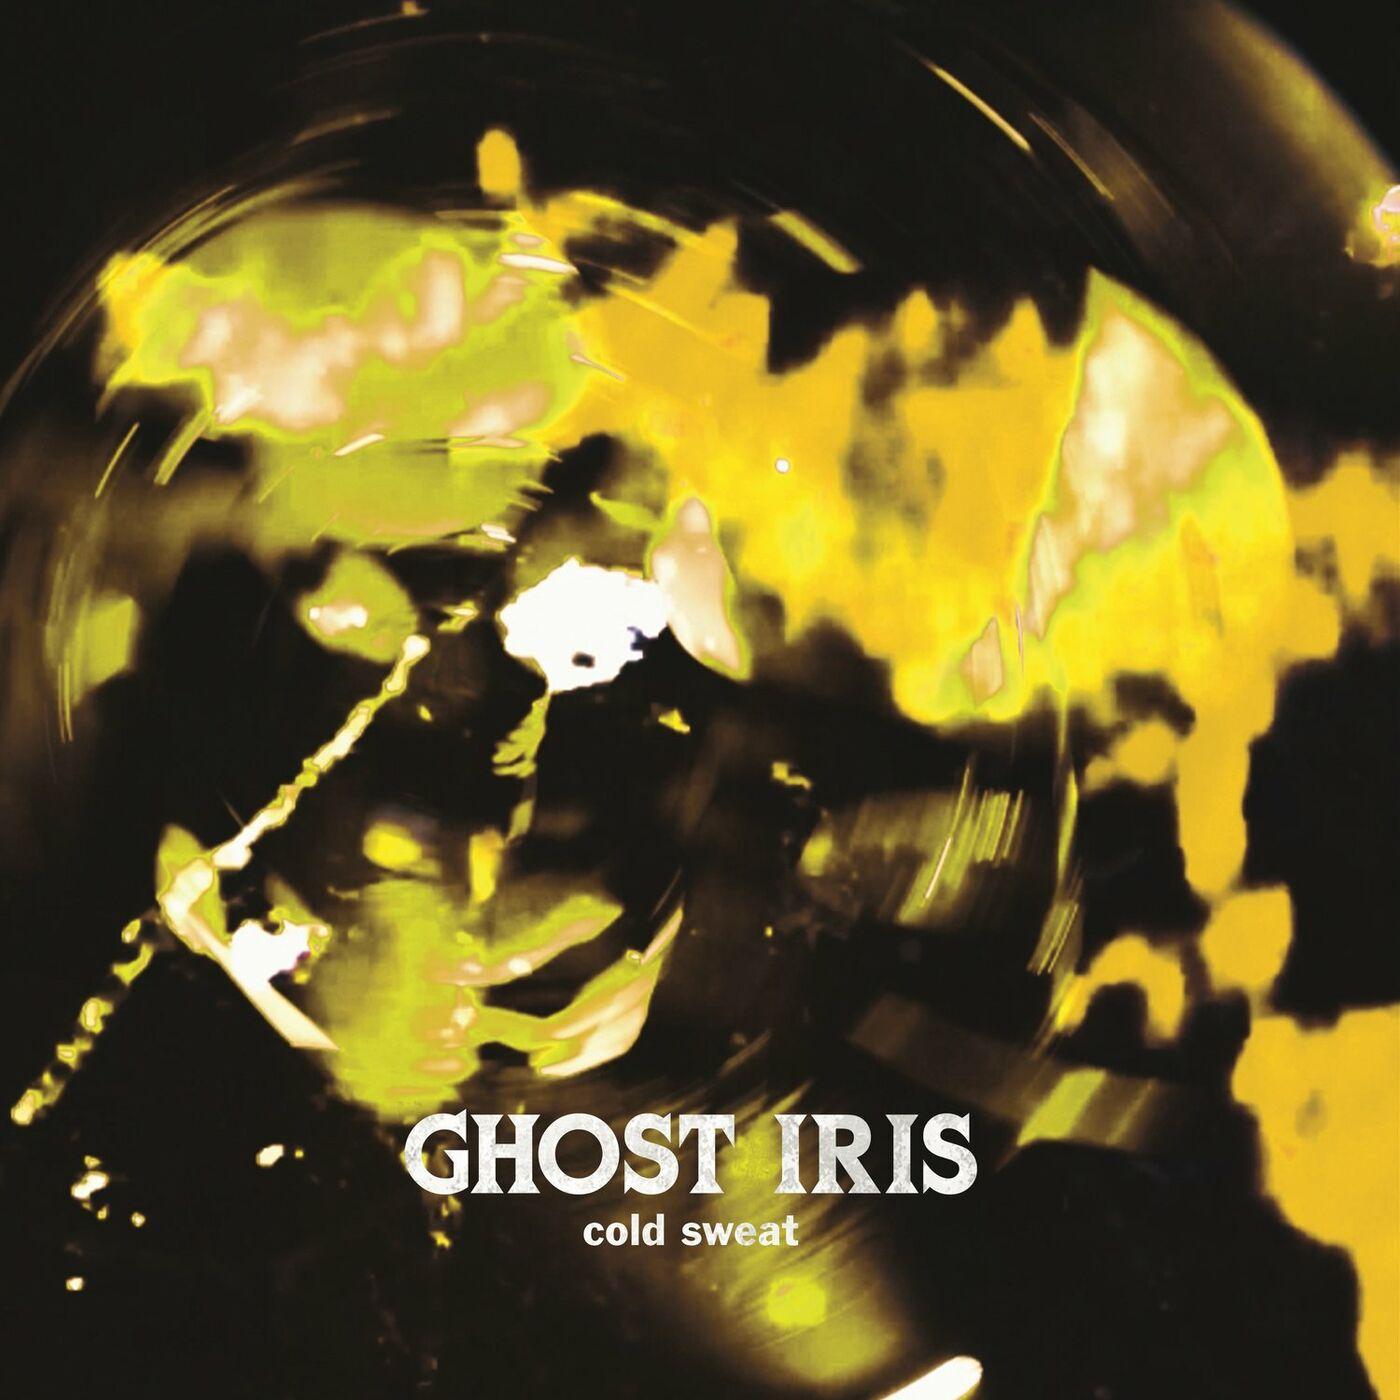 Ghost Iris - Cold Sweat [single] (2021)